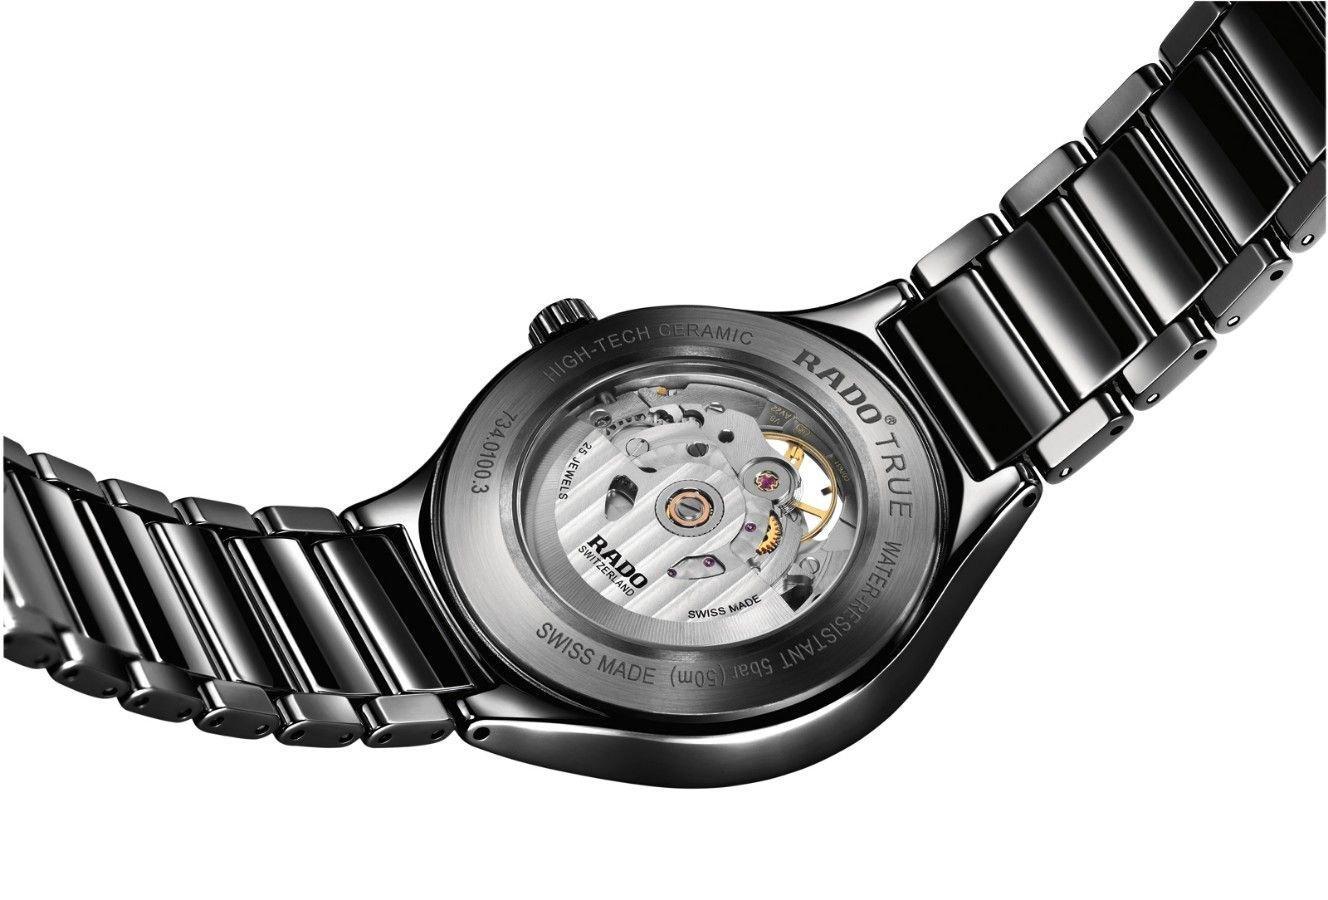 rado swiss lion swiss watches. Black Bedroom Furniture Sets. Home Design Ideas